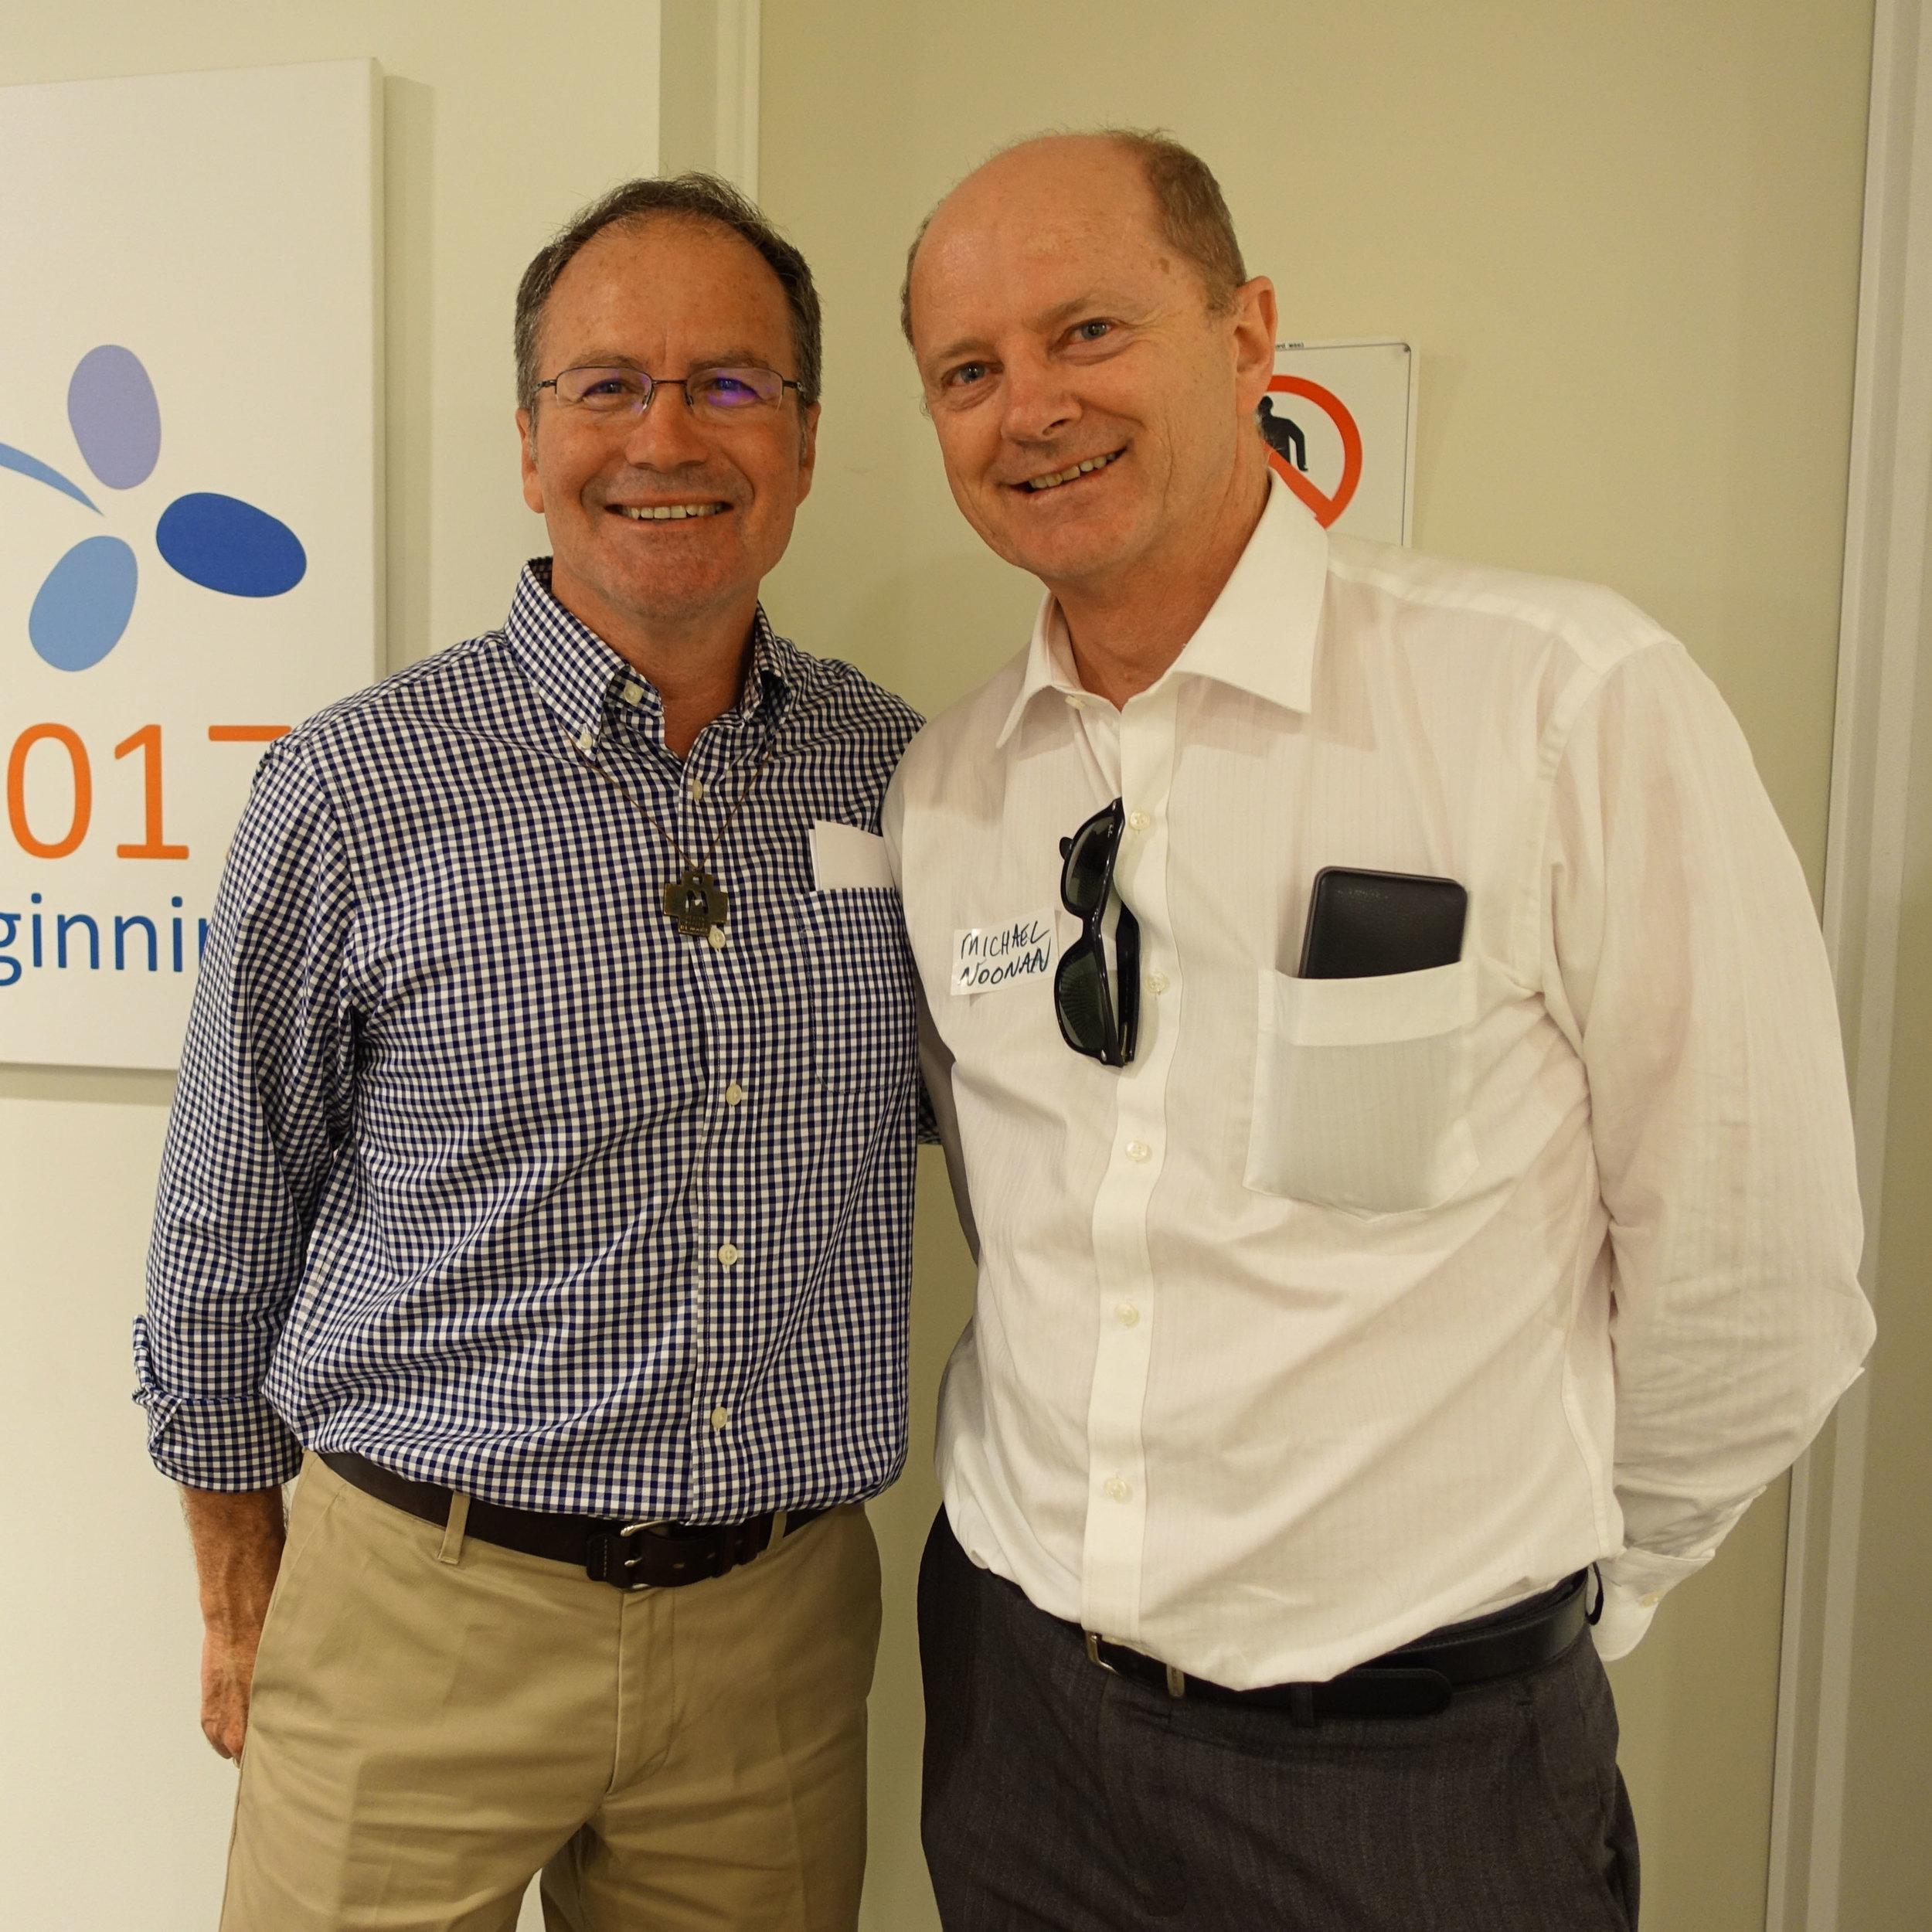 Br Tony Clark and Michael Noonan exchanging stories